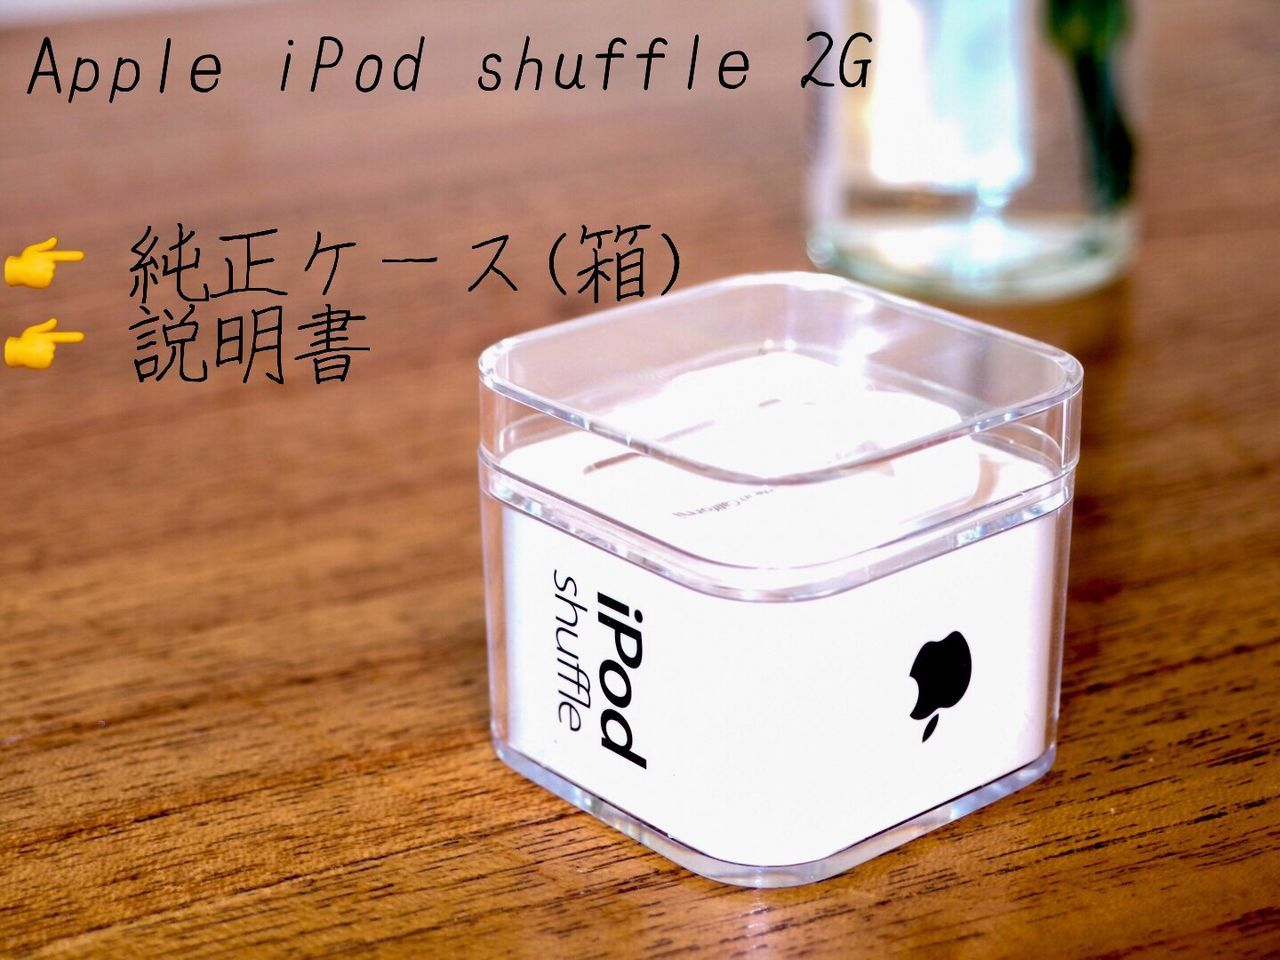 Apple Ipod Shuffle Case Japan